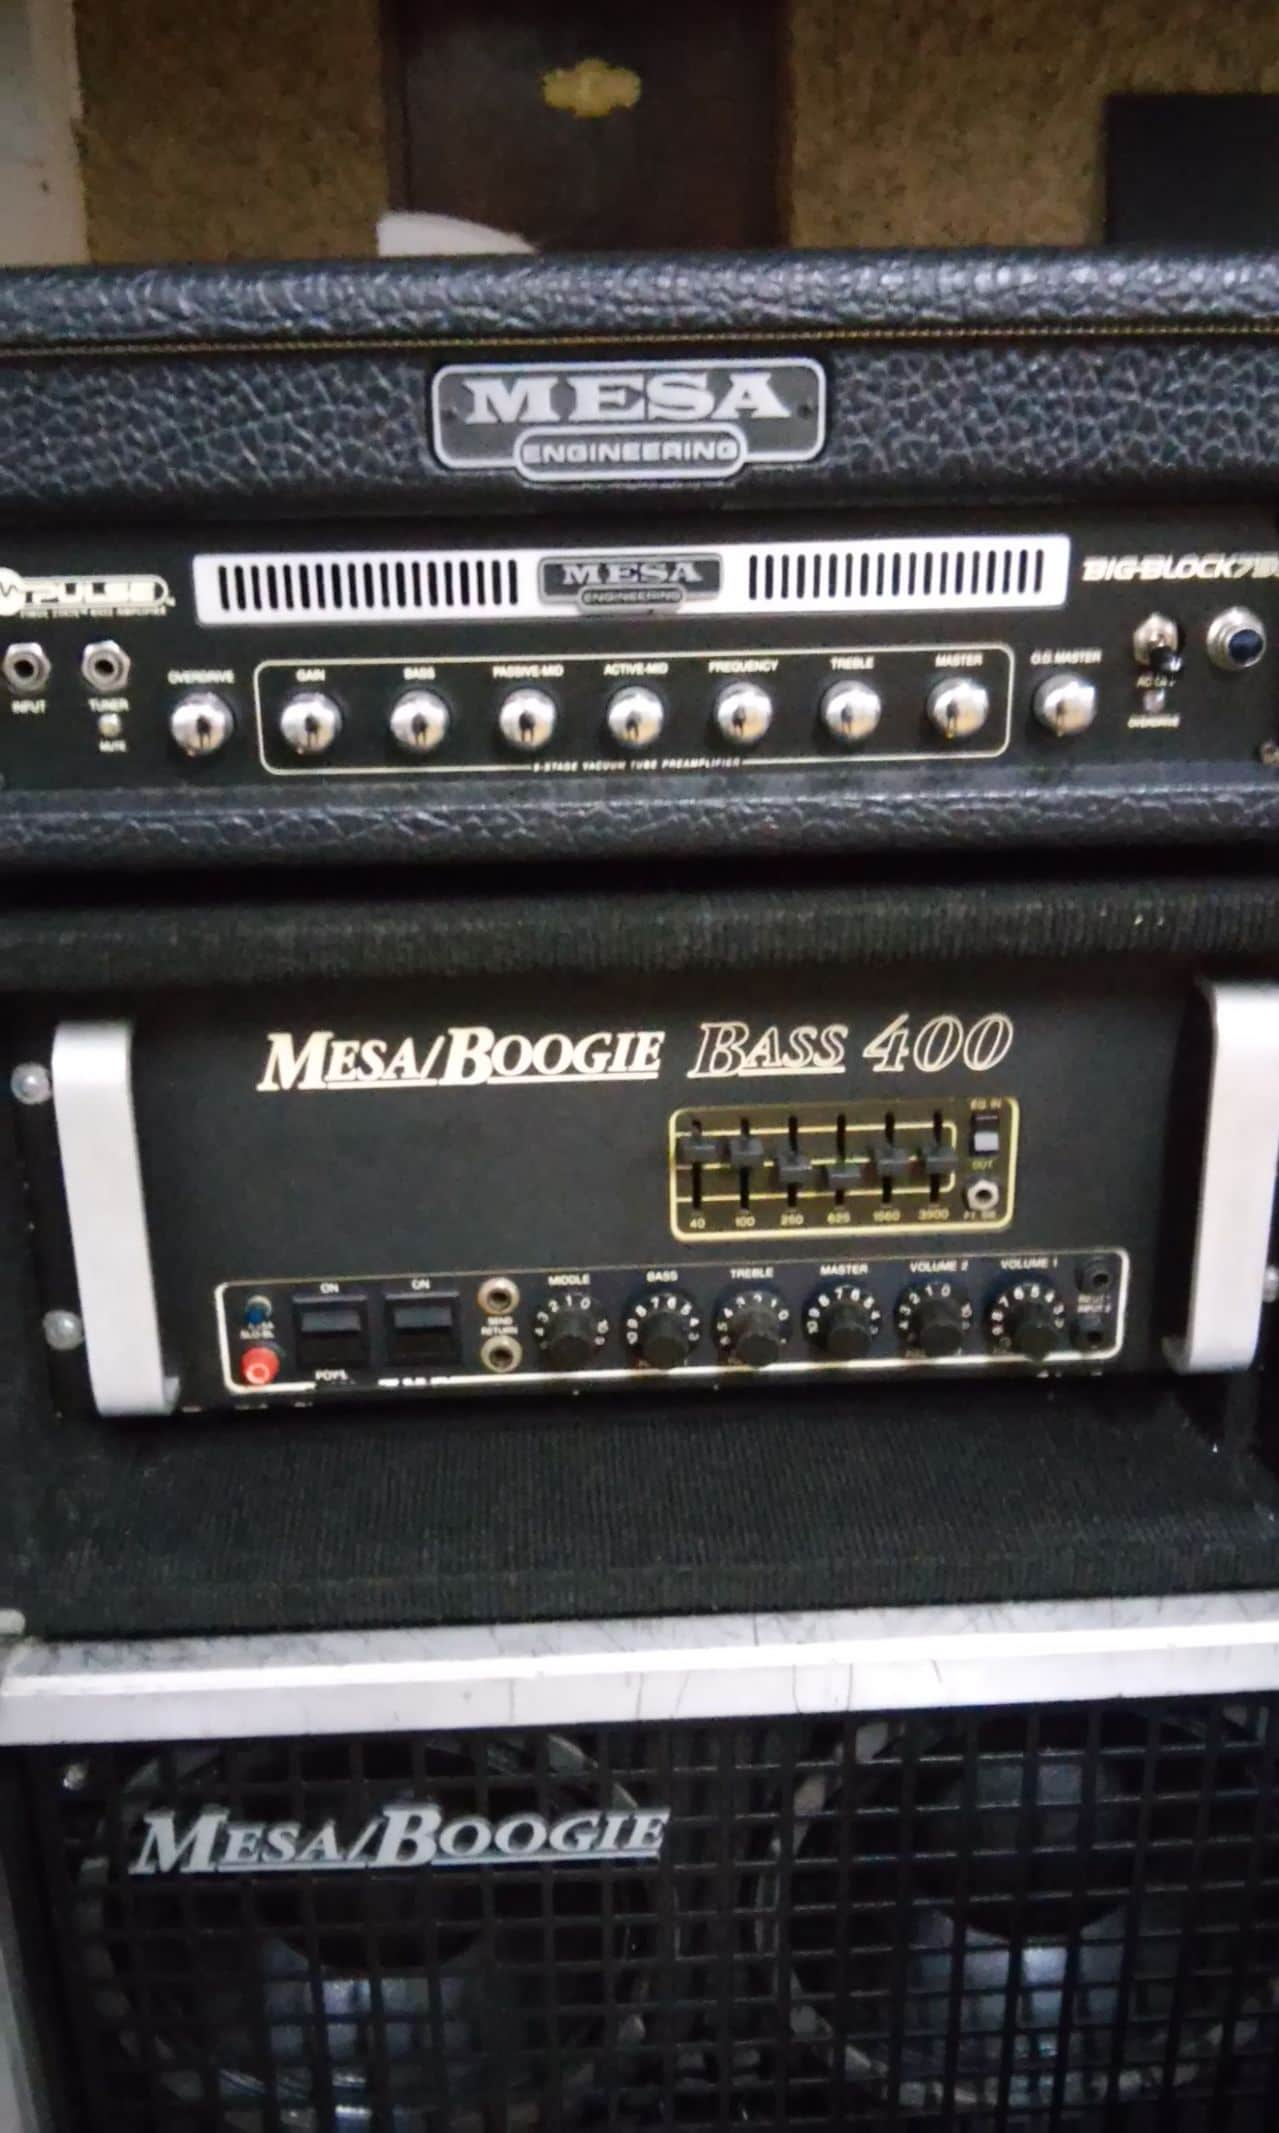 Mesa Boogie Club - Página 2 20140809_192237